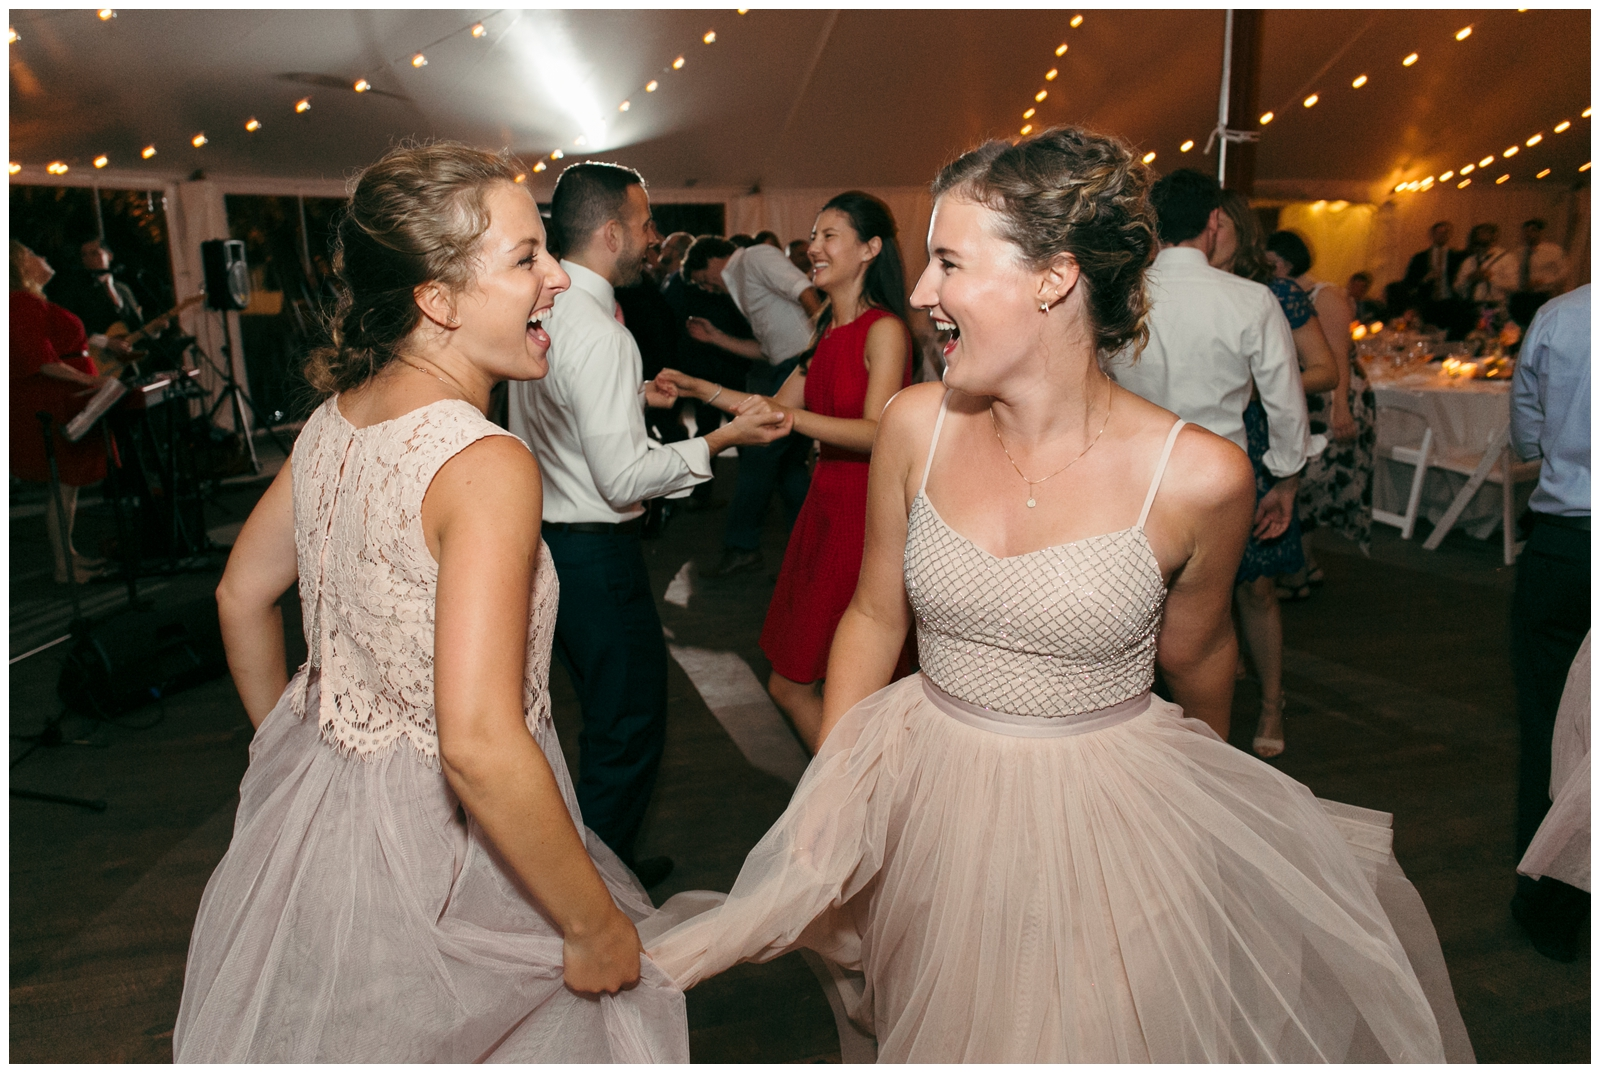 Moraine-Farm-wedding-Bailey-Q-Photo-Massachusetts-wedding-photpgrapher-150.jpg